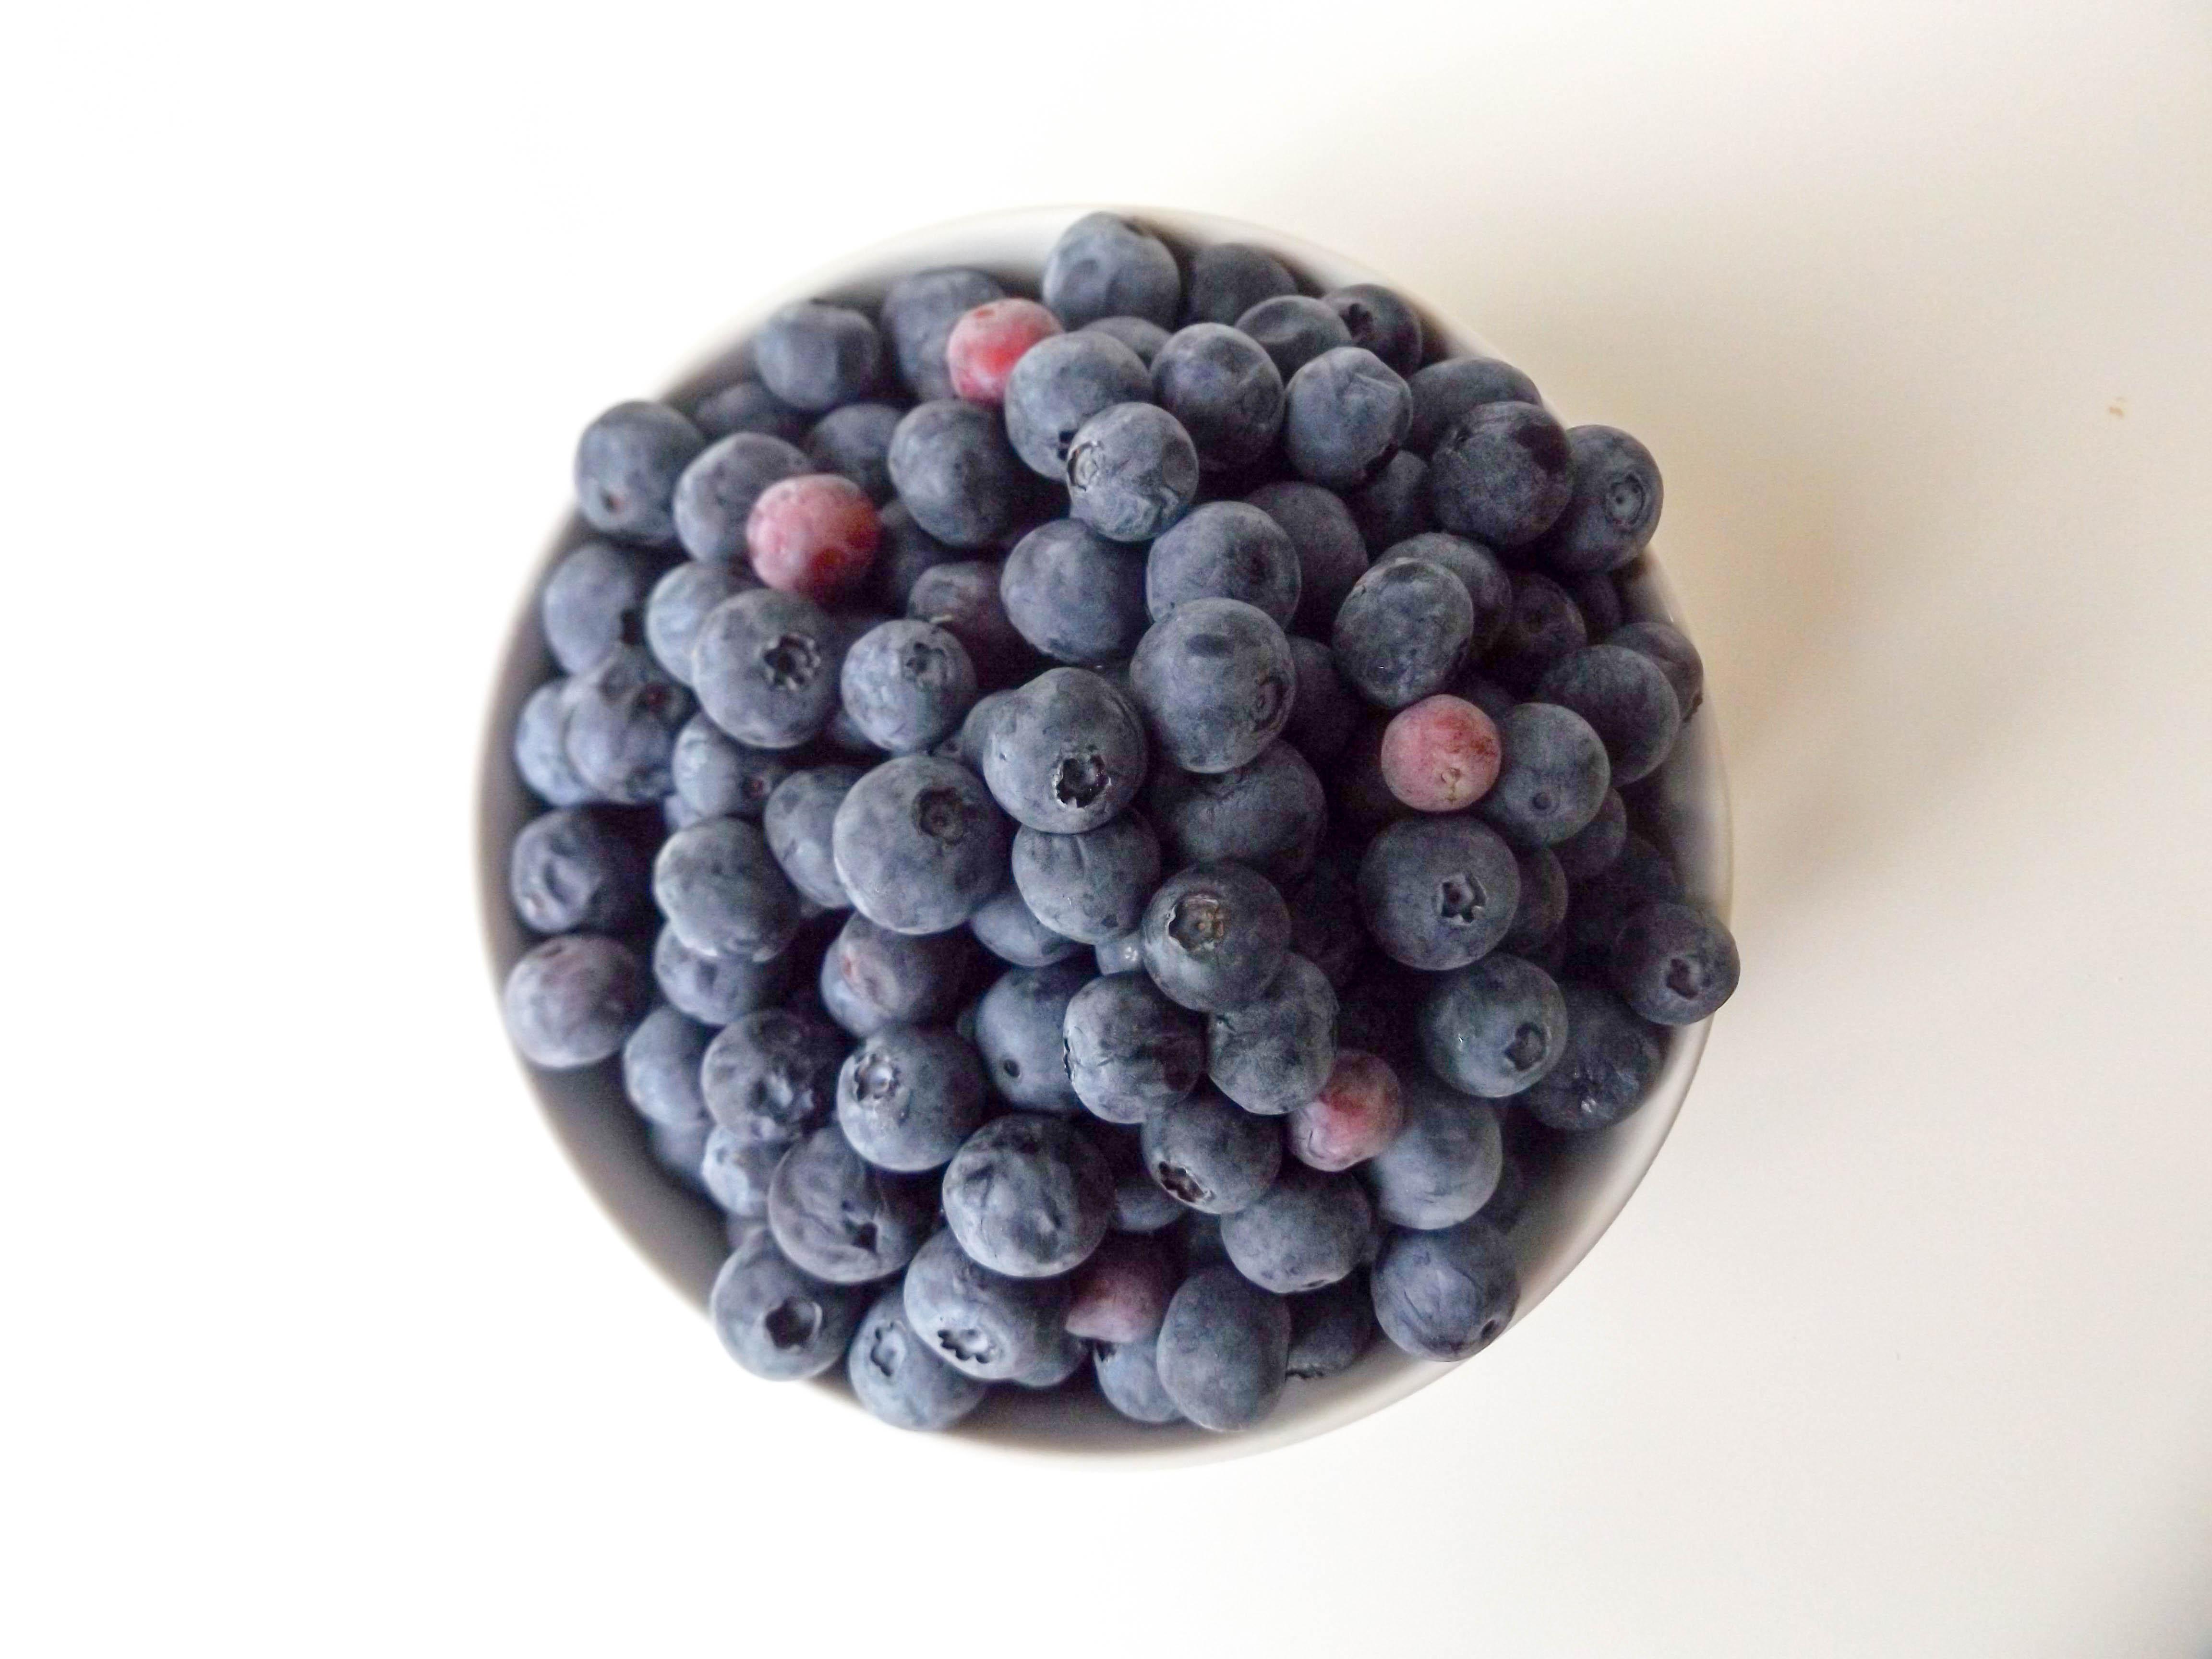 Featured Ingredient: Blueberries